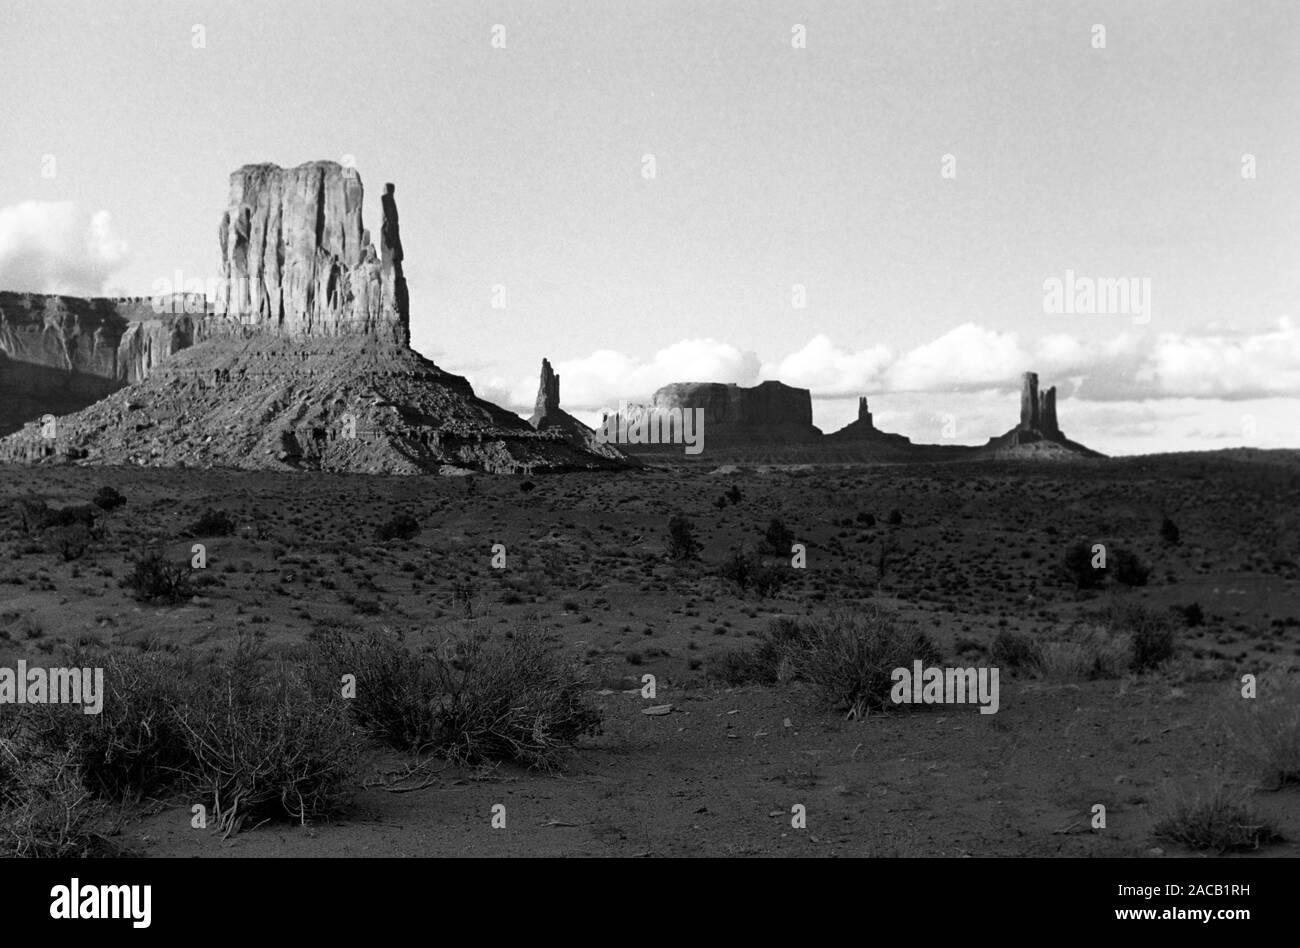 Monument Valley in Utah/Arizona, 1962. Monument Valley in Utah/Arizona, 1962. Stockfoto